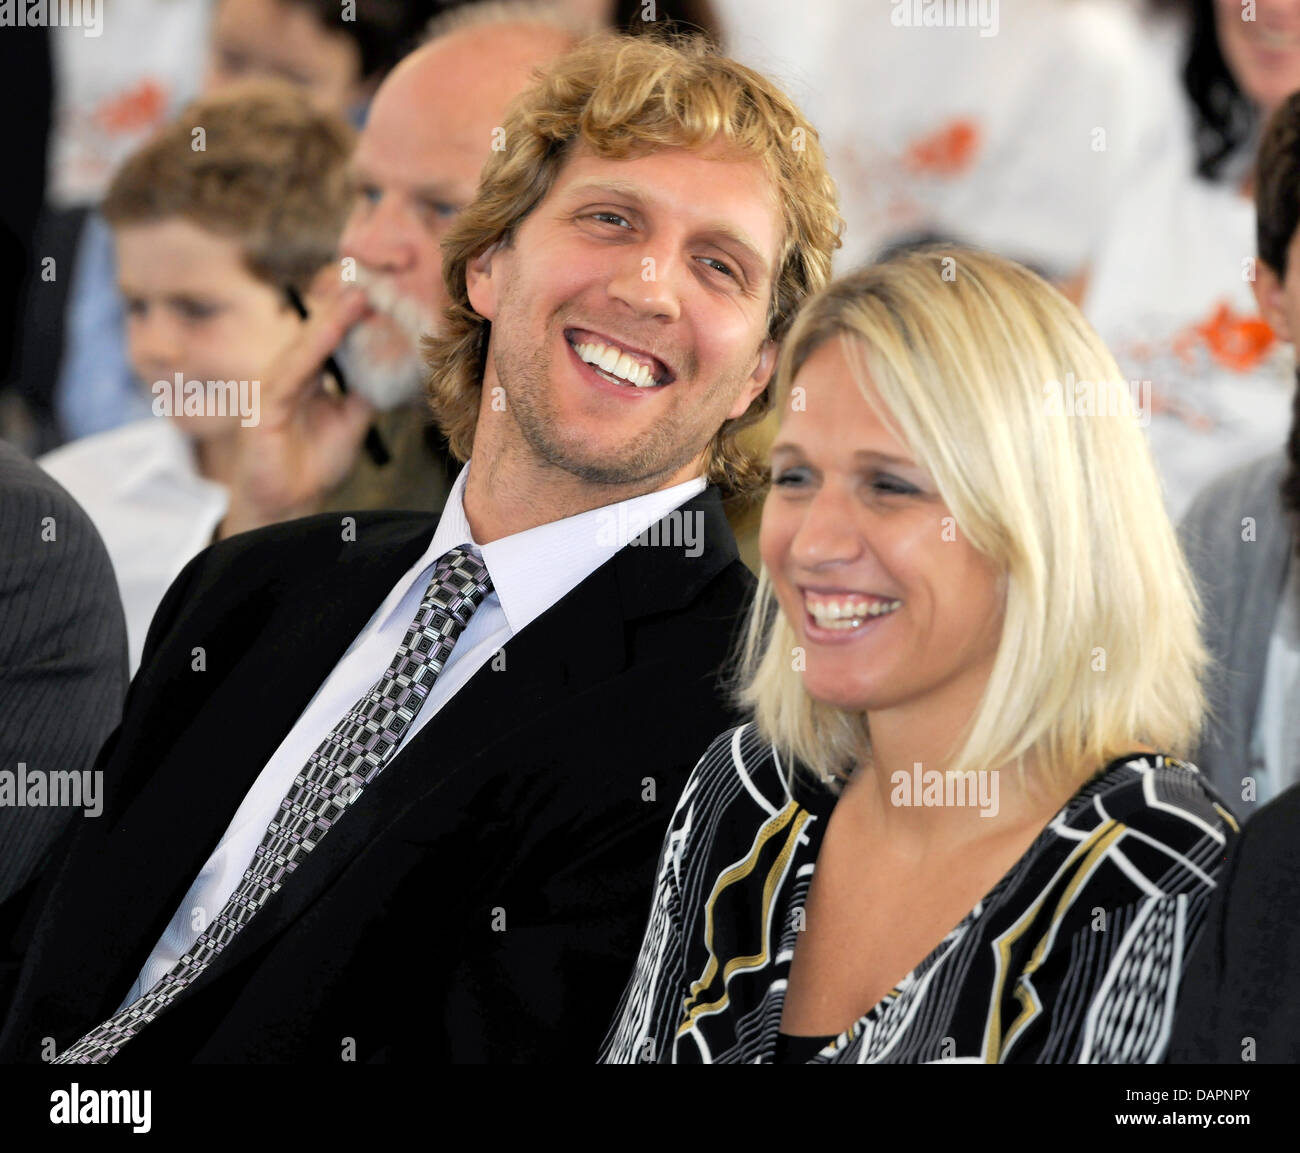 German basketball player Dirk Nowitzki and his sister ...  German basketba...